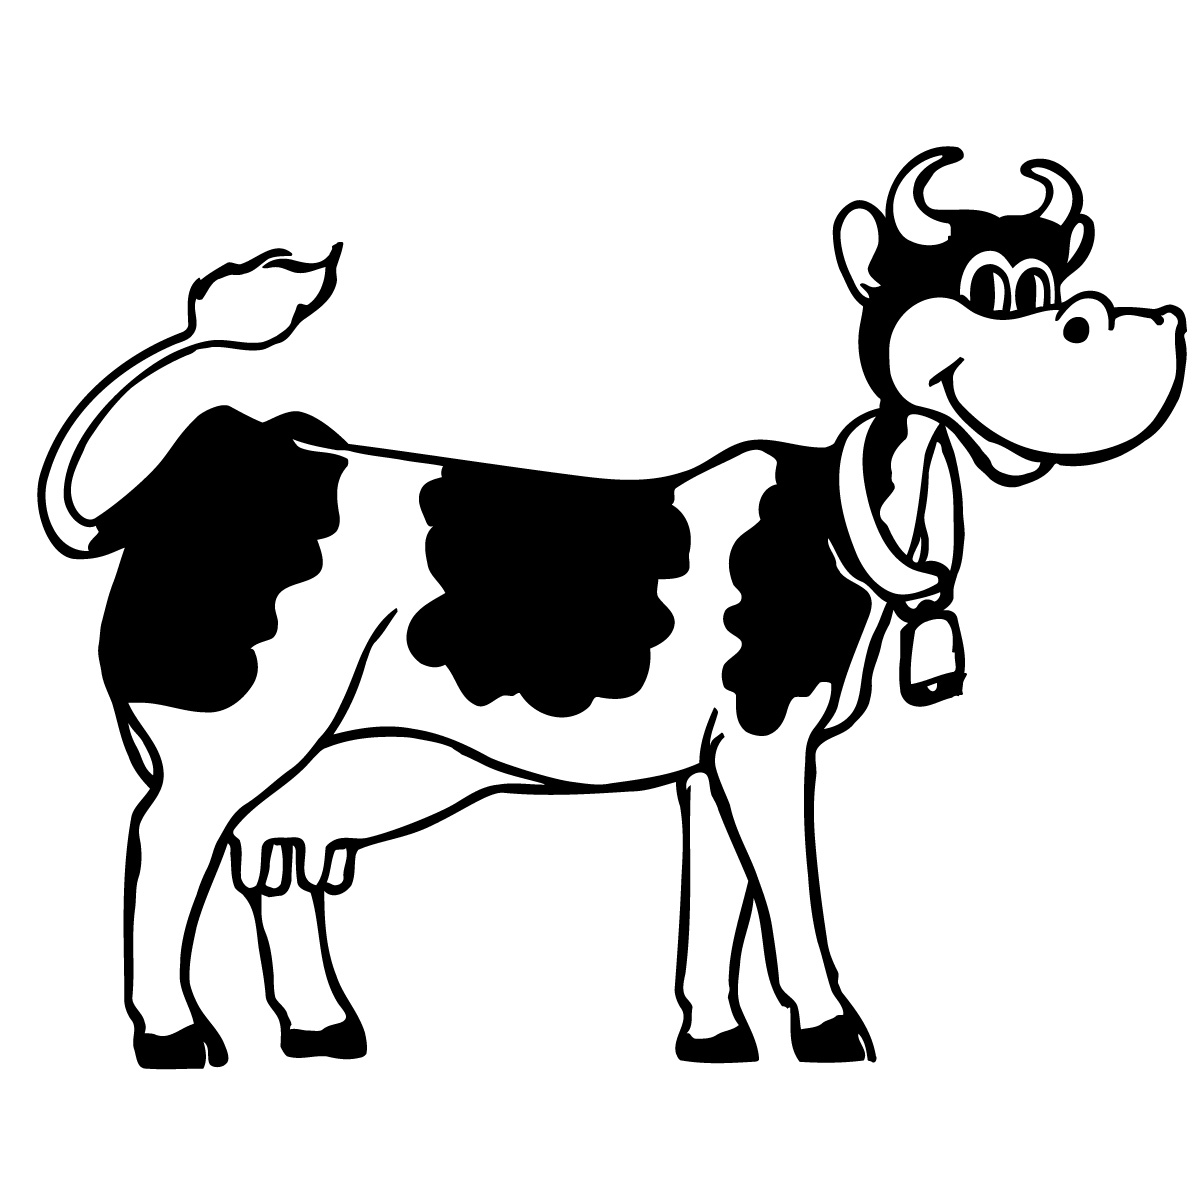 1200x1200 Cartoon Cow Pictures, Cartoon Cow, Cartoon Cows Tedlillyfanclub